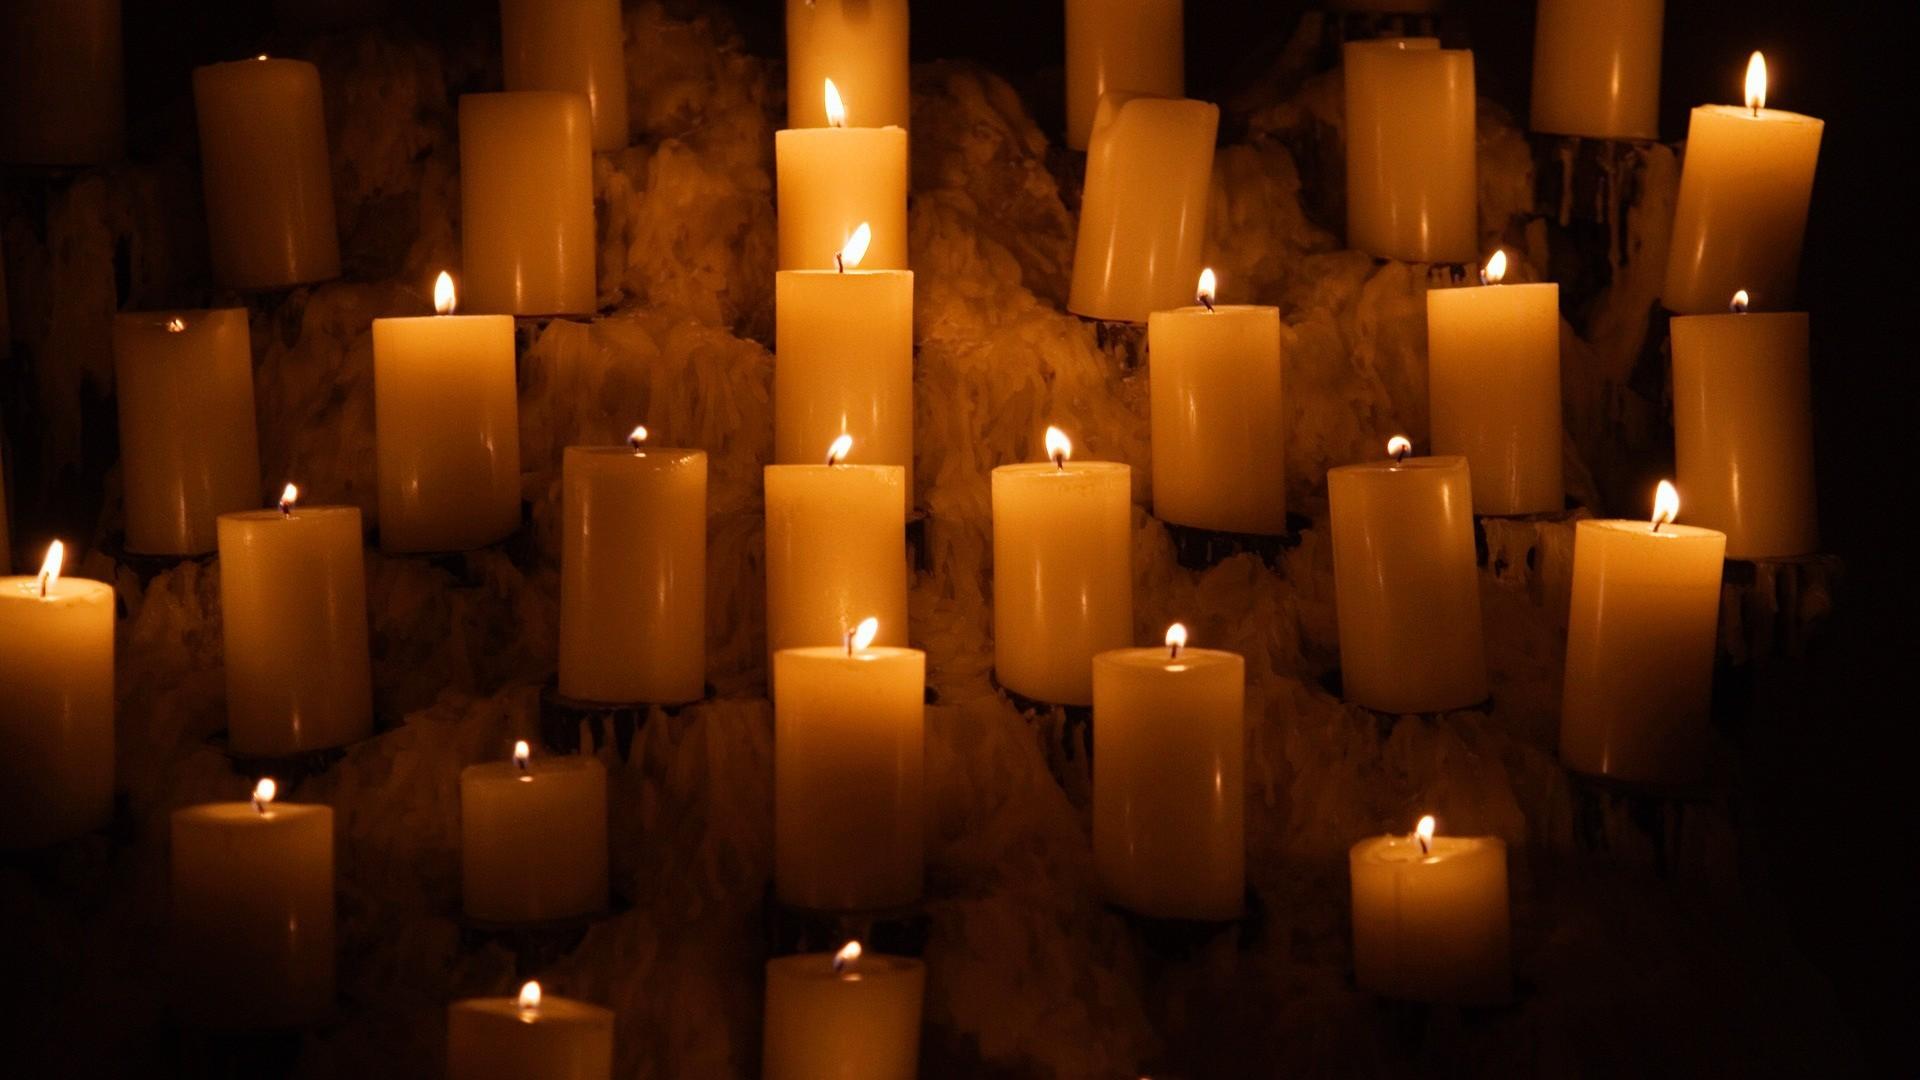 … x 1080 Original. Description: Download Candle Lights Celebrations  wallpaper …